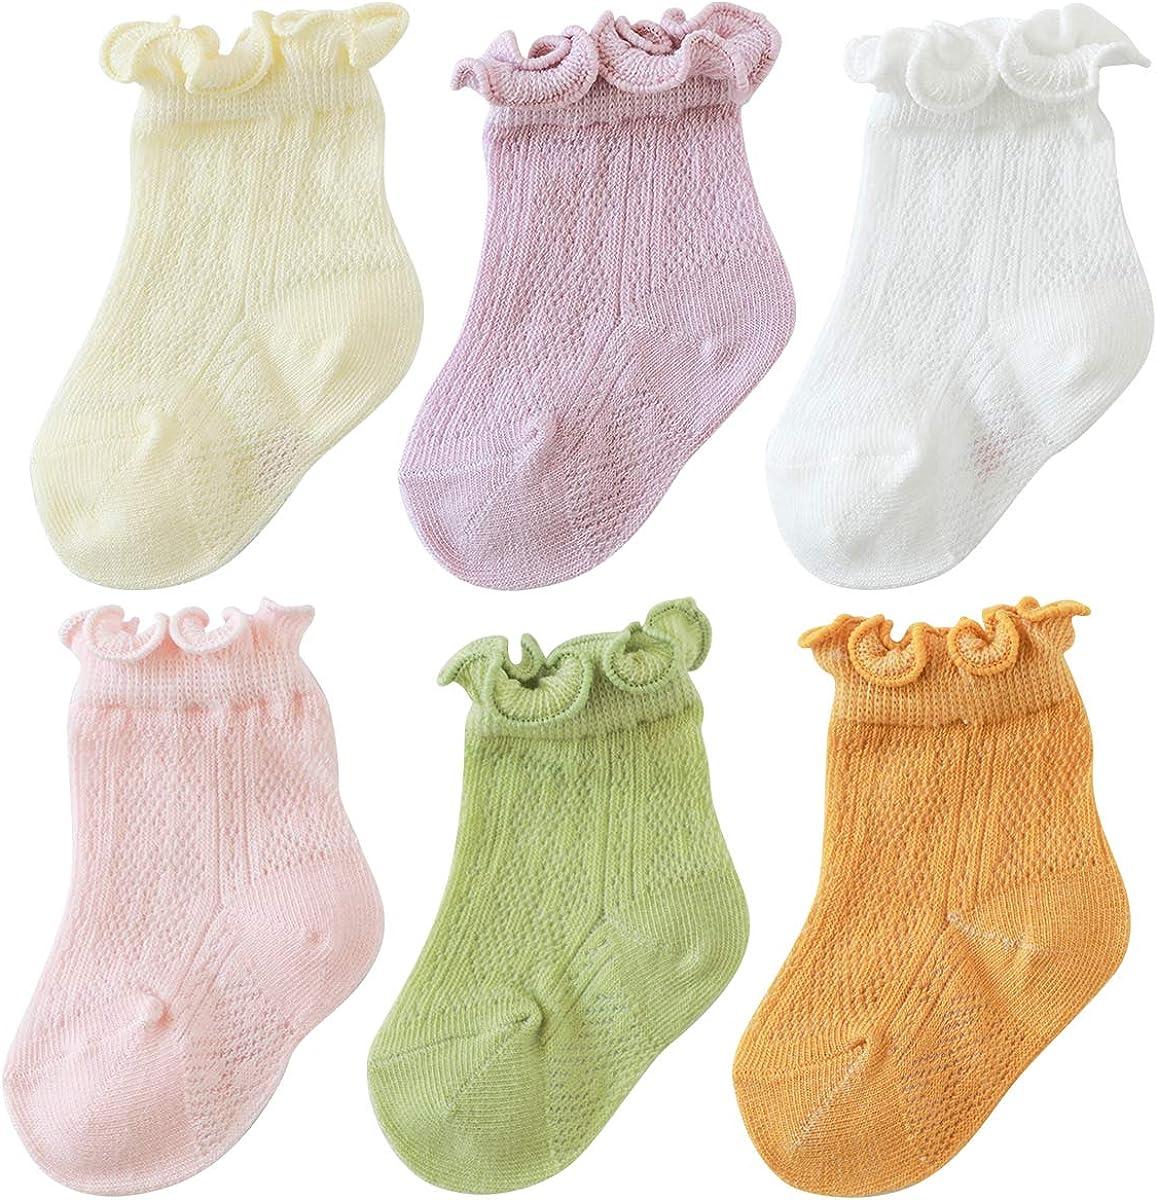 vanberfia Baby Toddler Girls Princess Cotton Frilly Socks Lace Ruffle Thin Mesh Socks 0-5T